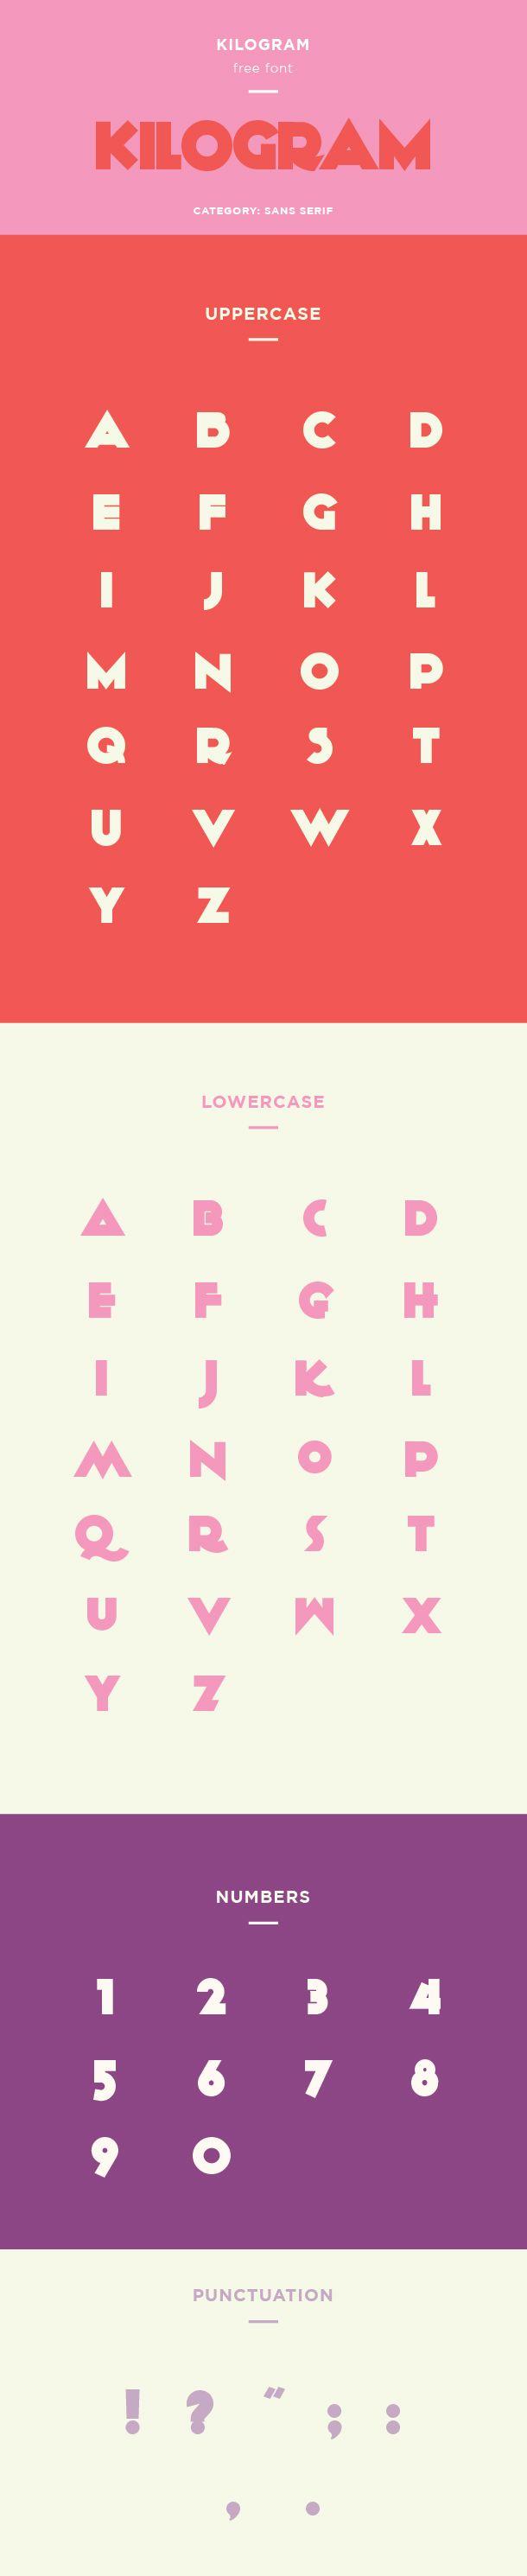 Kilogram Free Font Click Here For Typeface Sans Serif